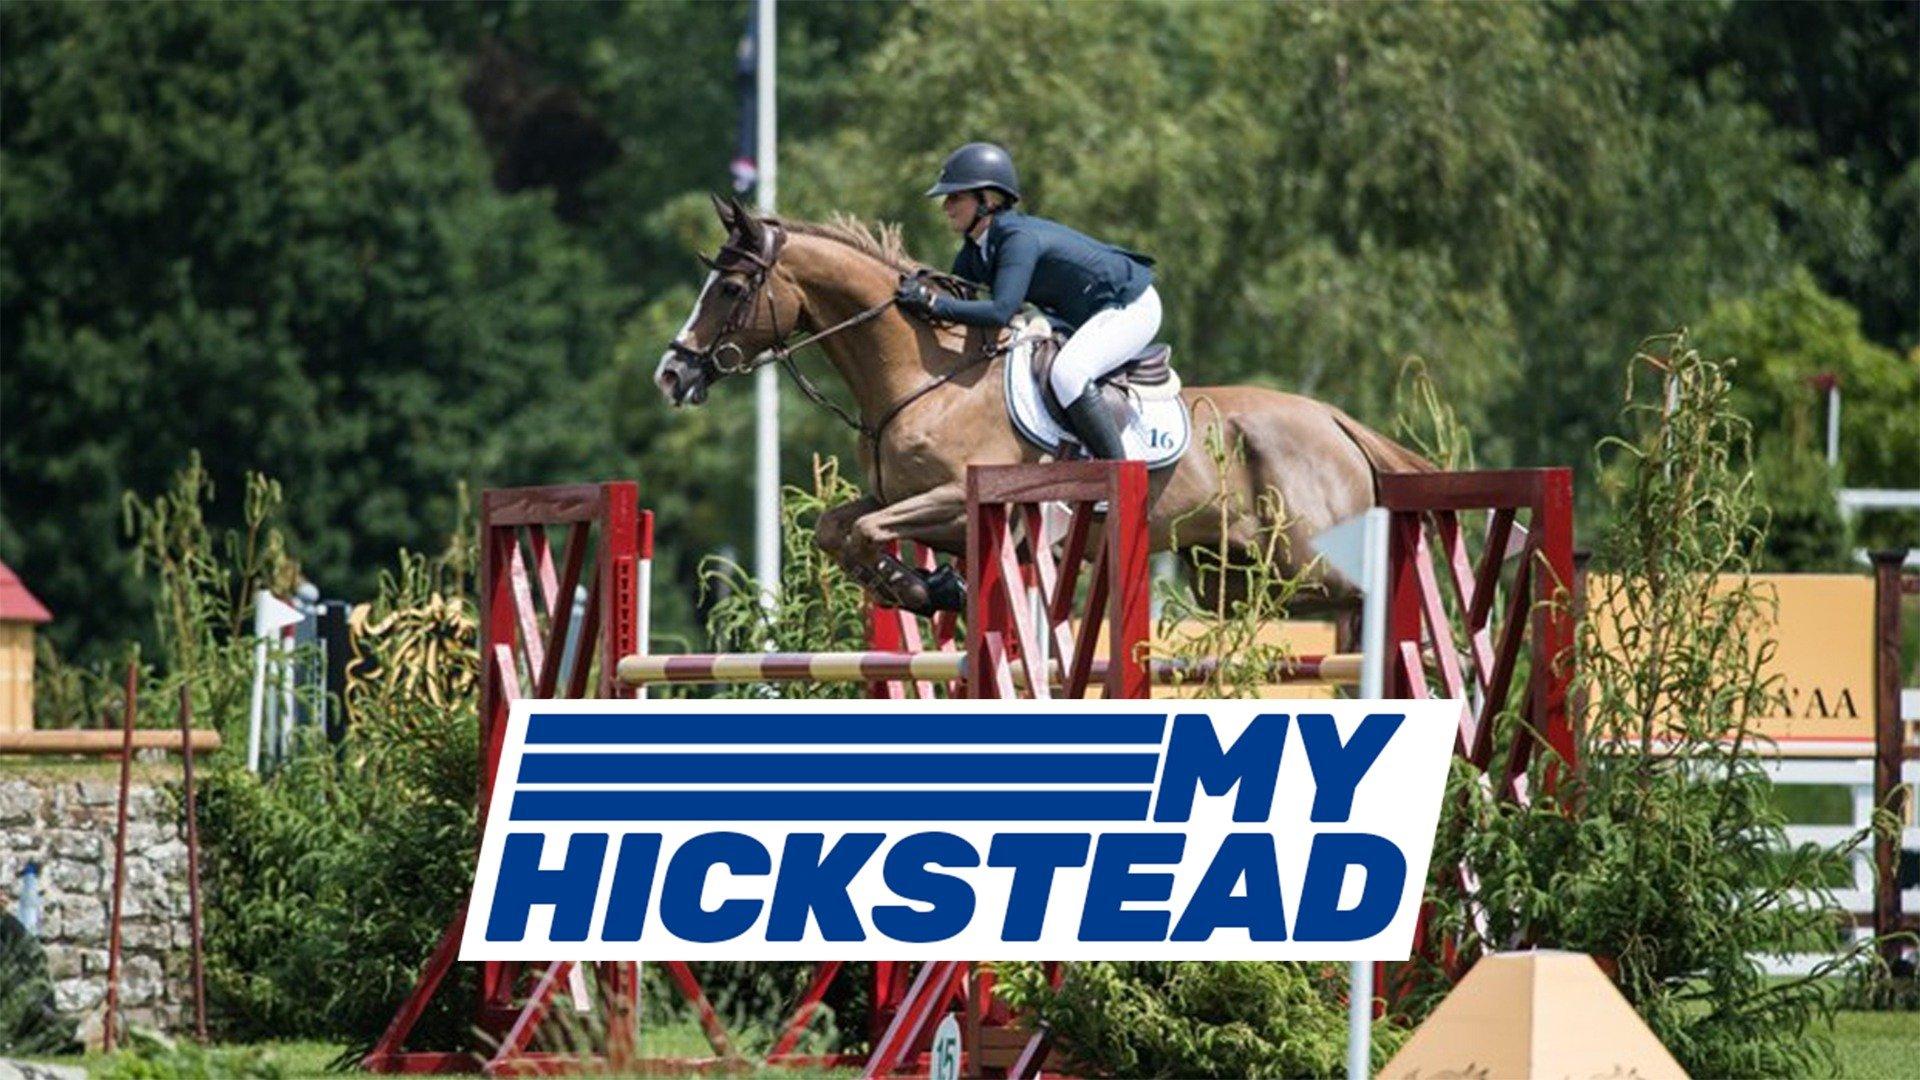 My Hickstead